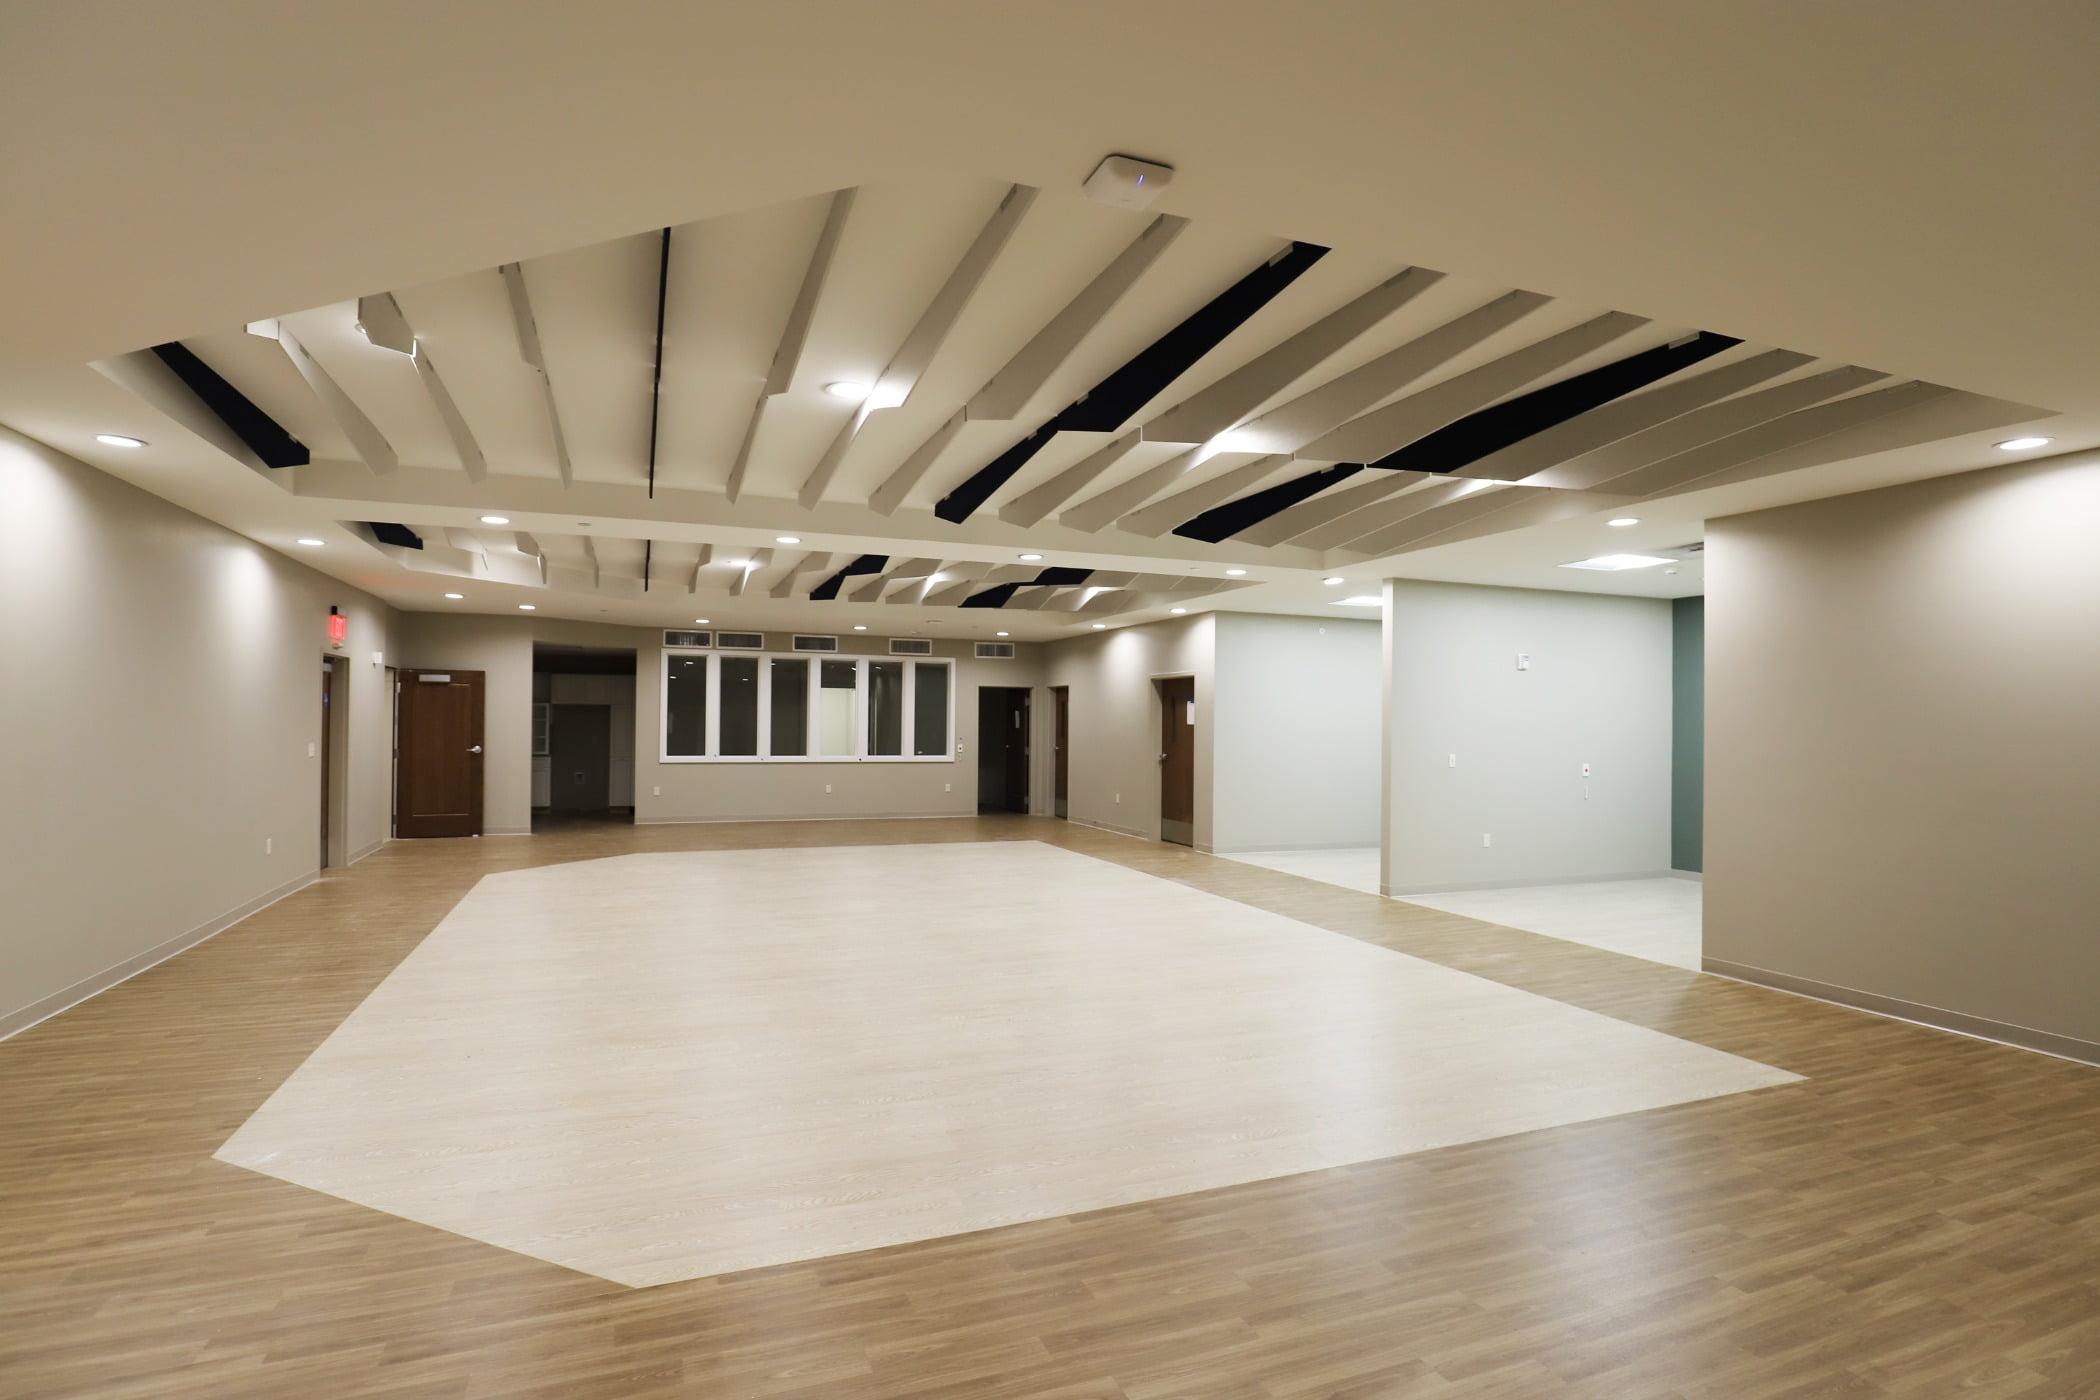 Wood stain, Laminate flooring, Building, Hall, Floor, House